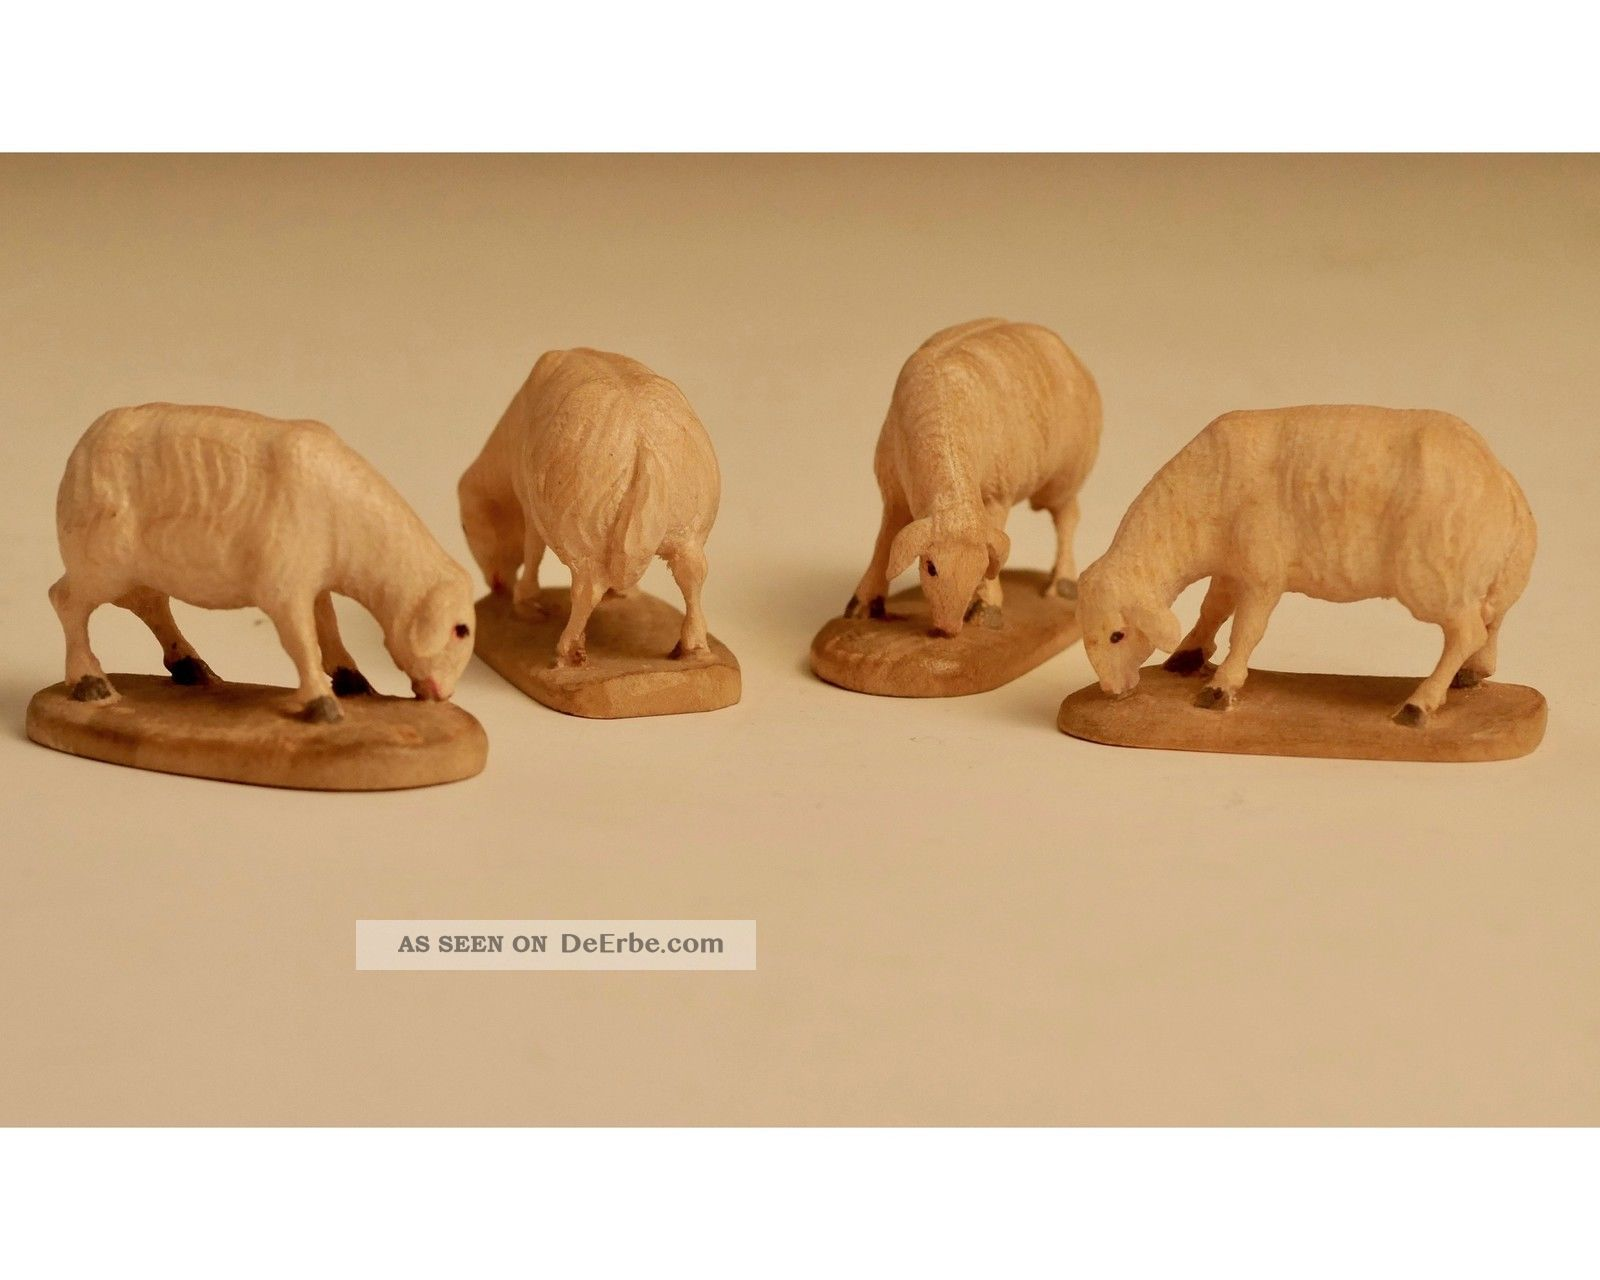 Krippenfiguren - Schafe - äsend - Holz Holzarbeiten Bild